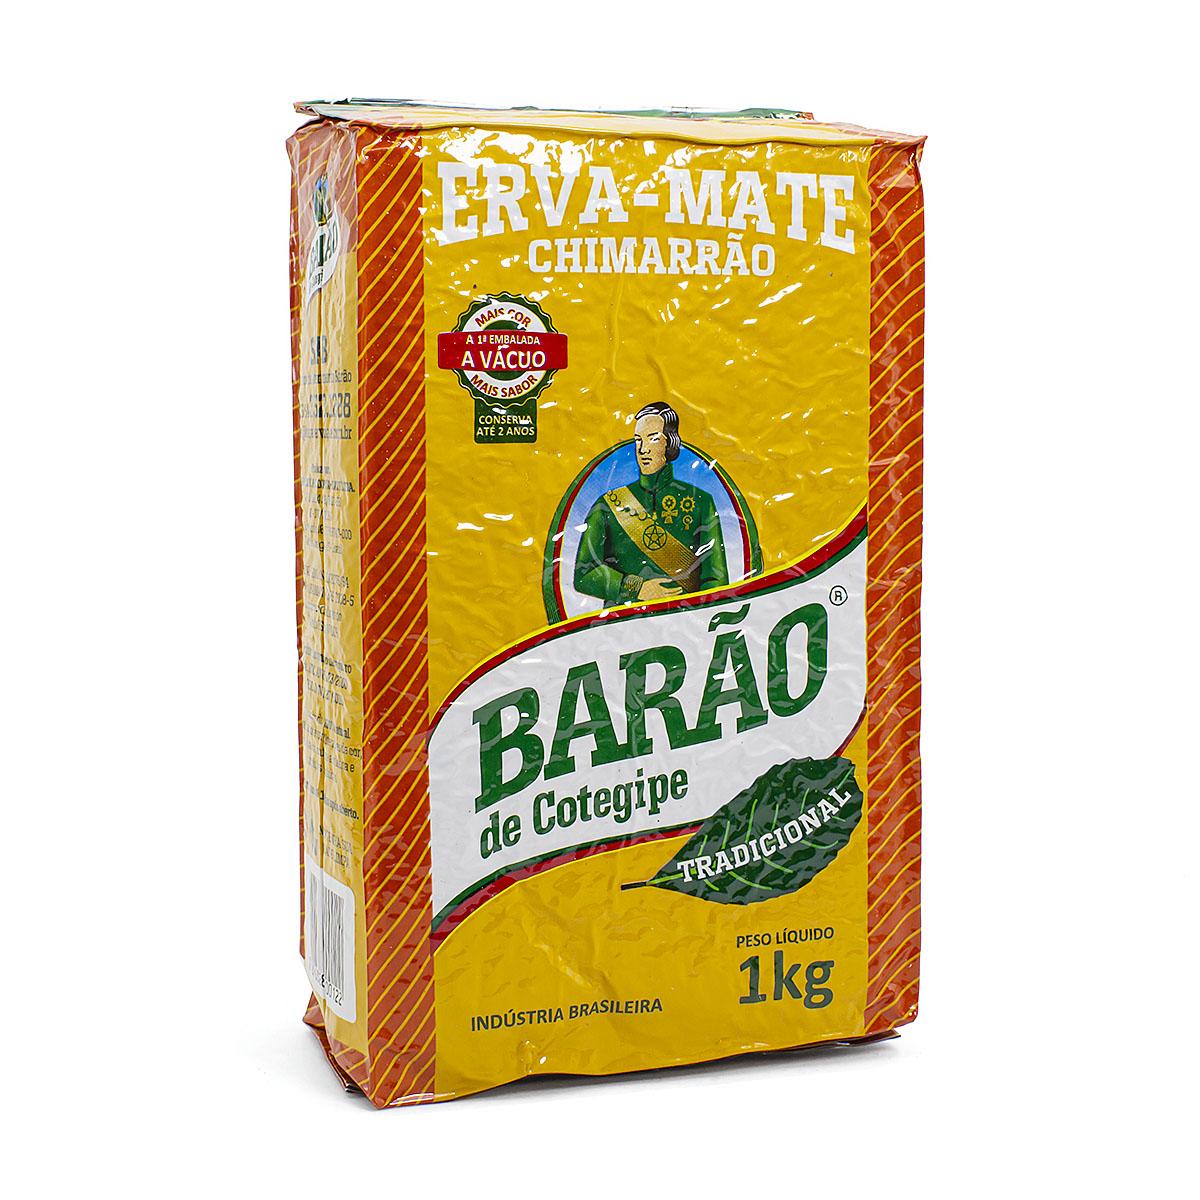 Мате Barao De Cotegipe Tradicional, 1000 г мате playadito tradicional 500 г